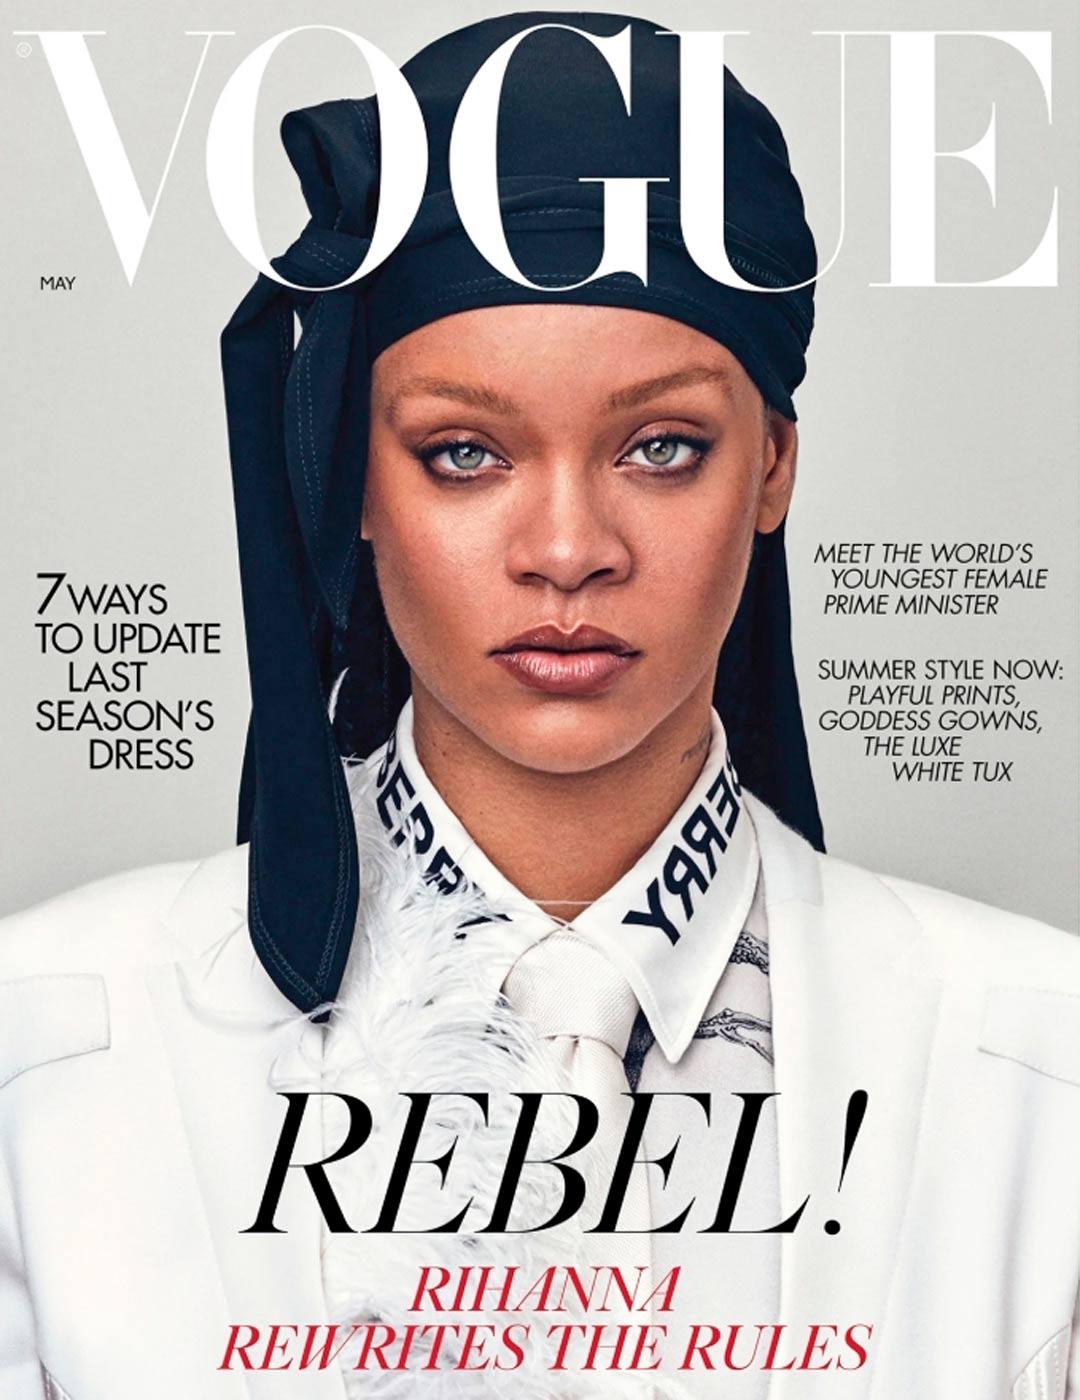 Voguen kansi, Rihanna ja Sanna Marin